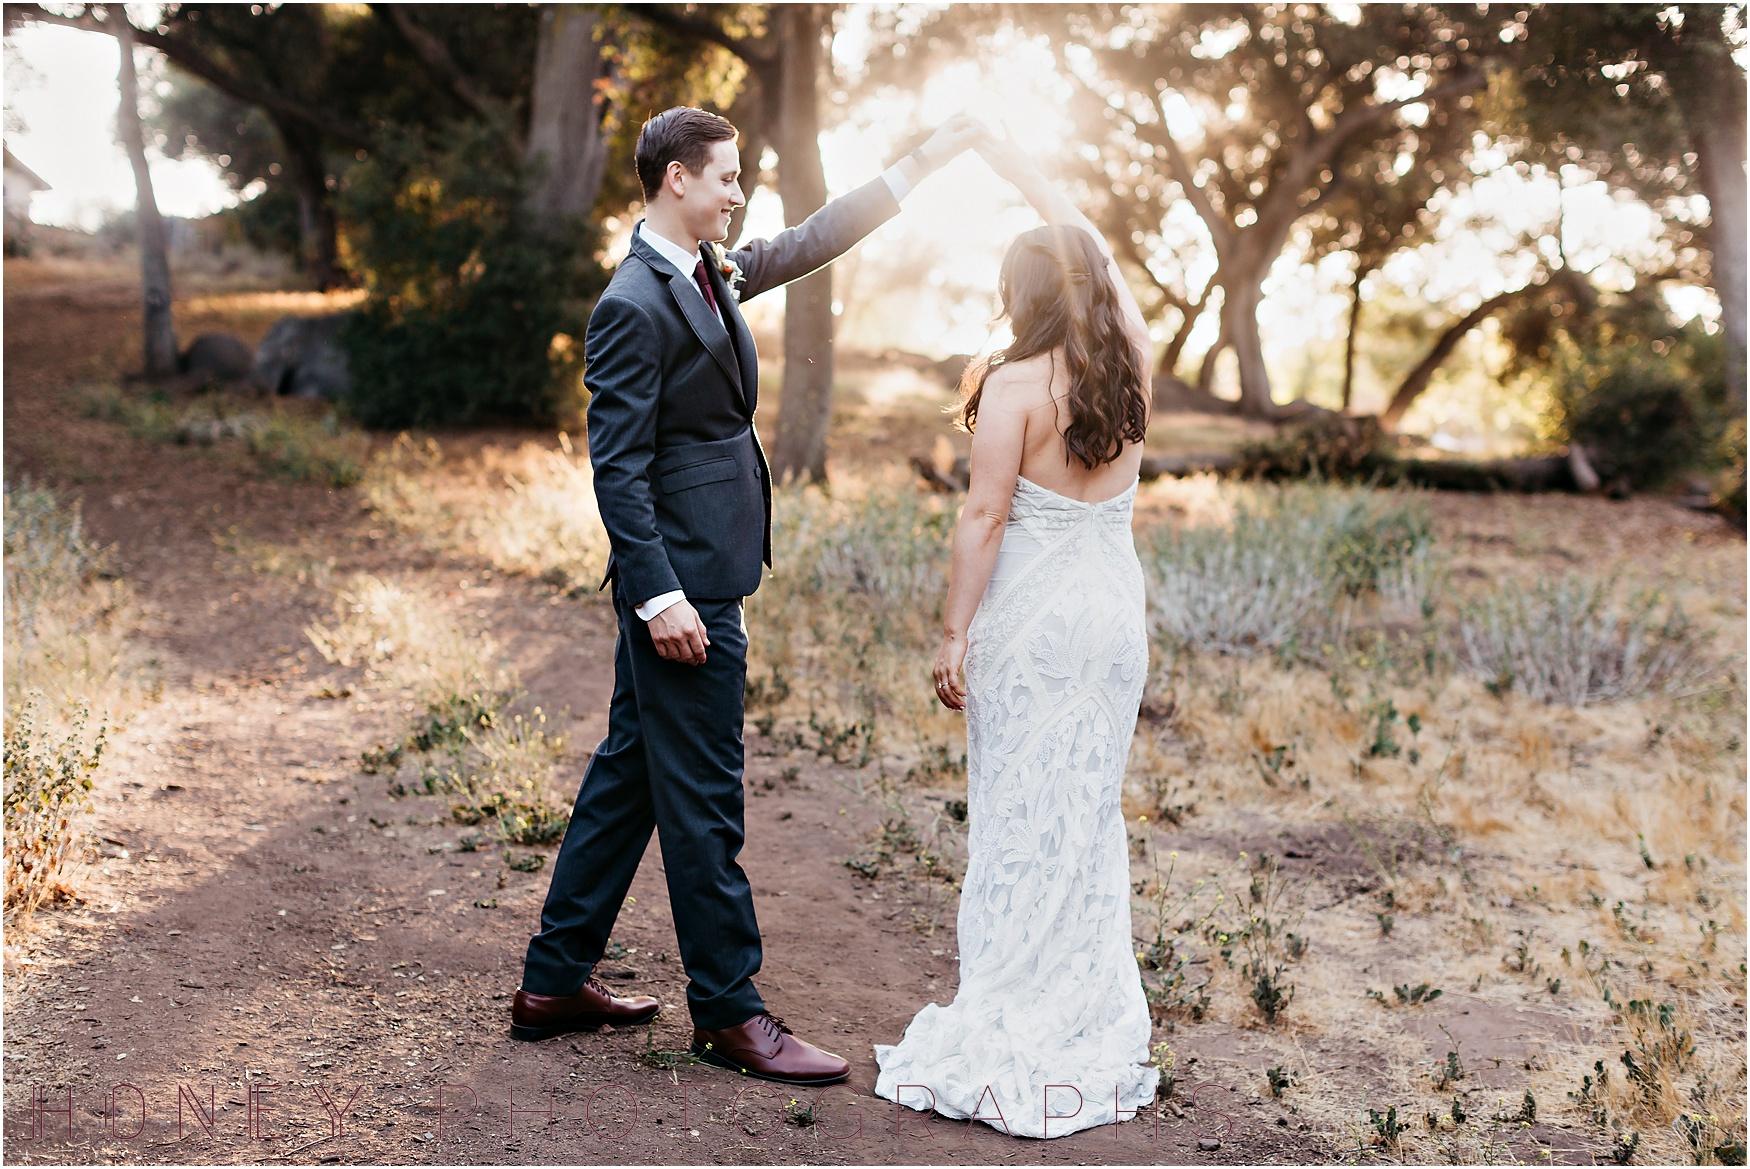 picnic-wedding-rustic-sweetheart-table-felicita-park-boho26.jpg